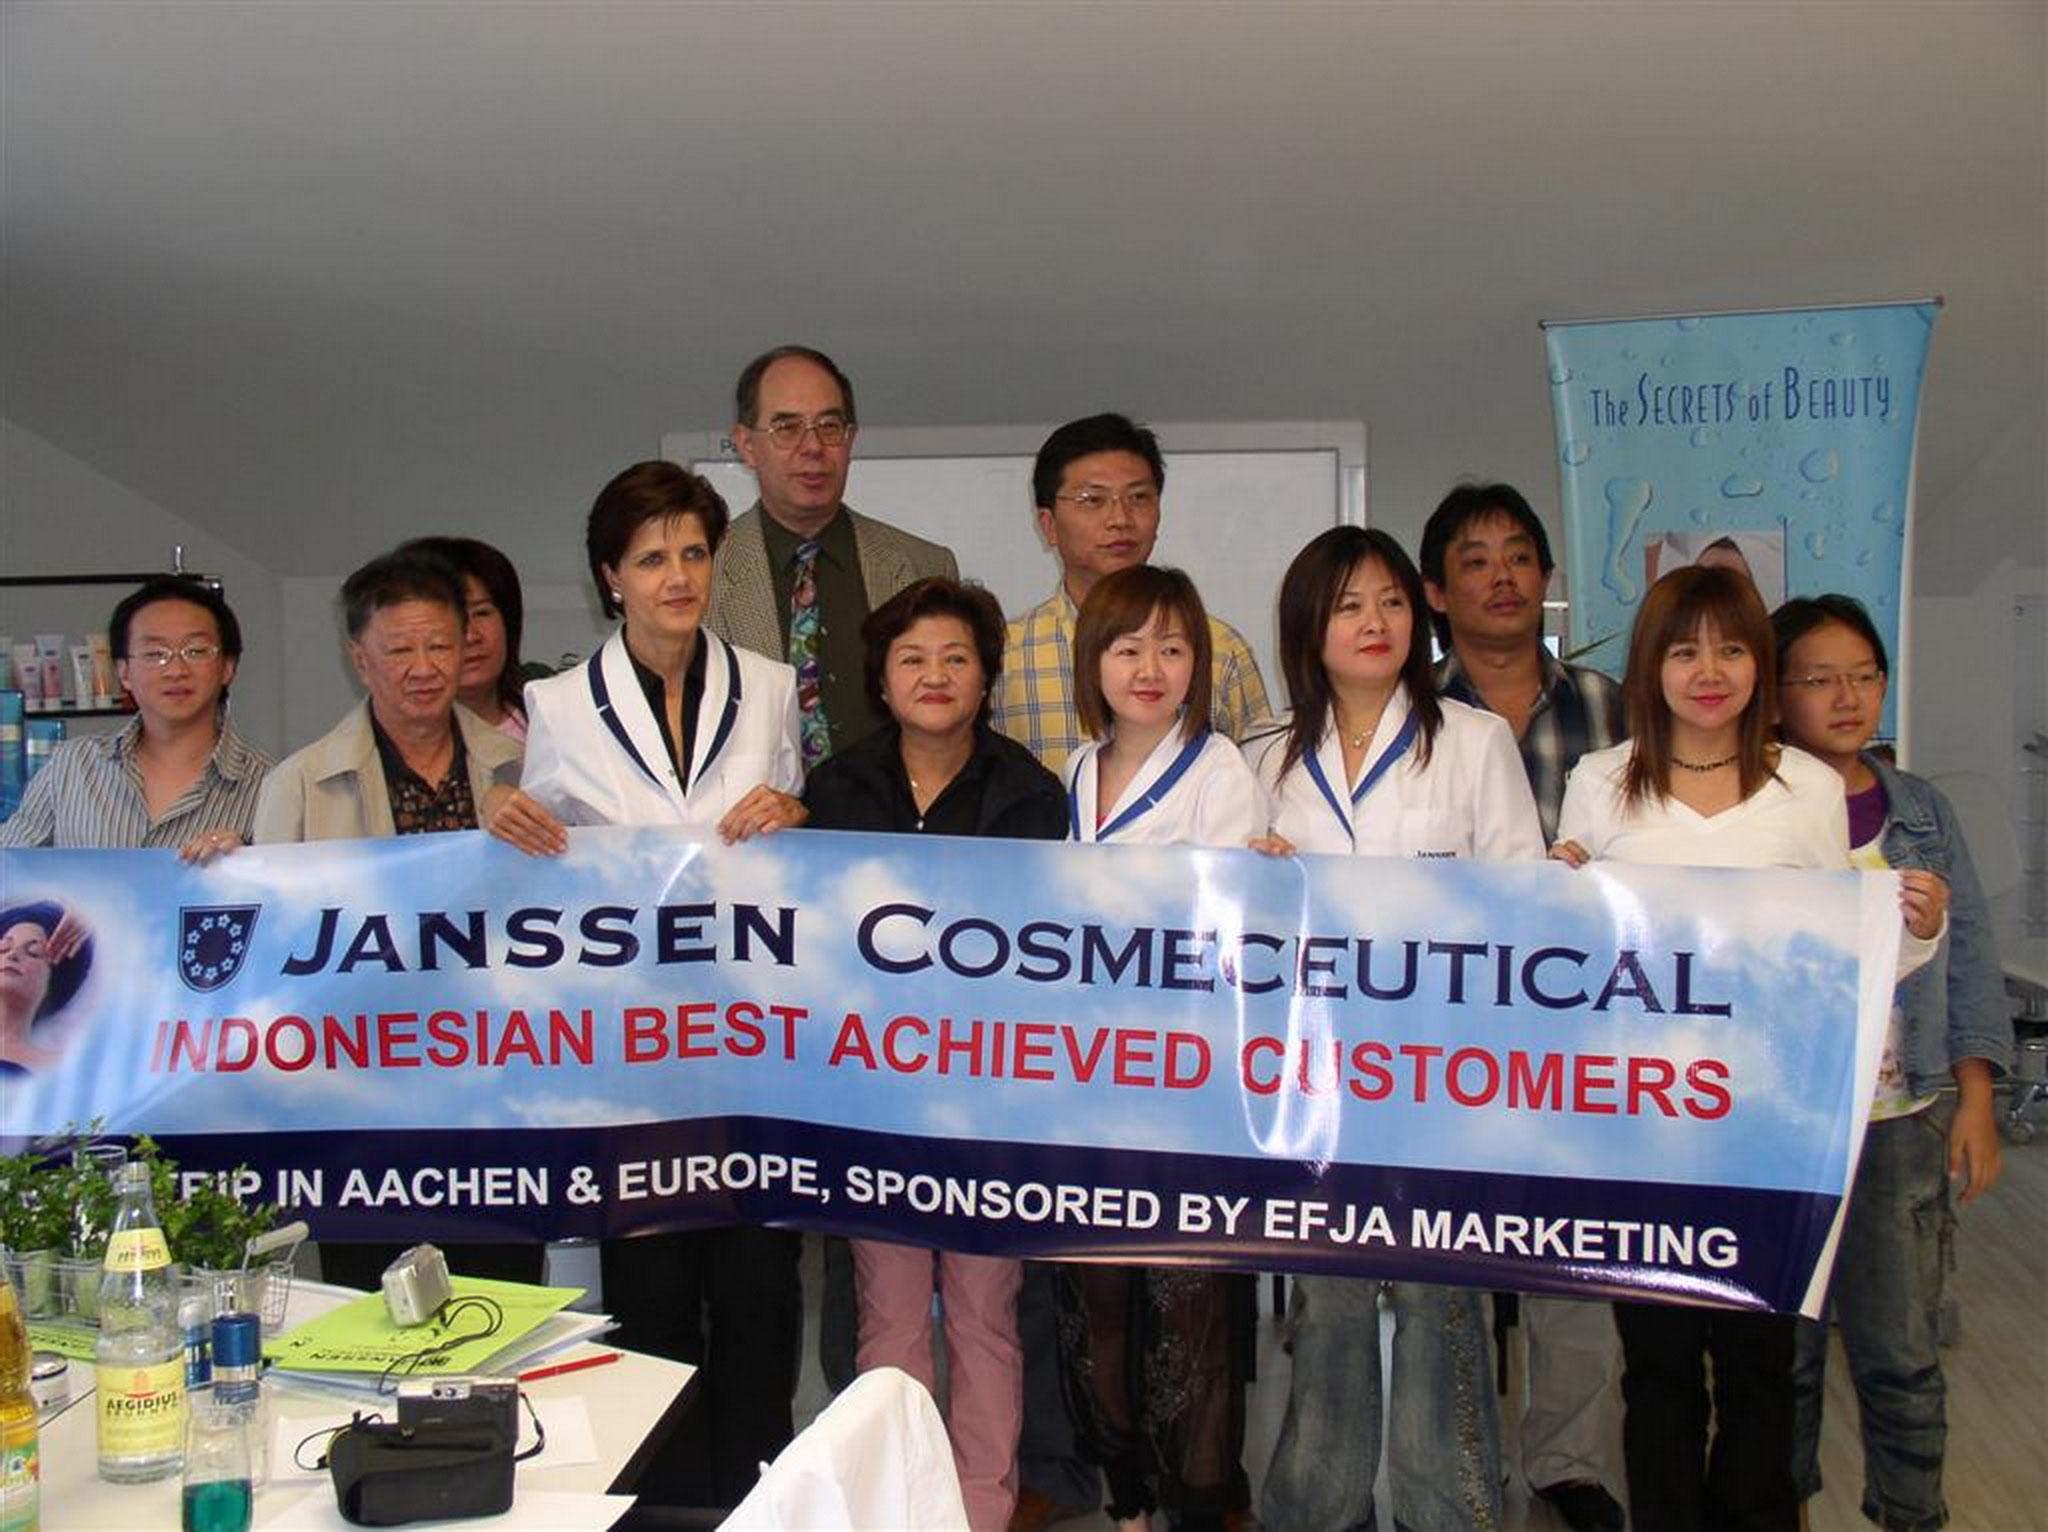 First Indonesia seminar in Aachen 2004